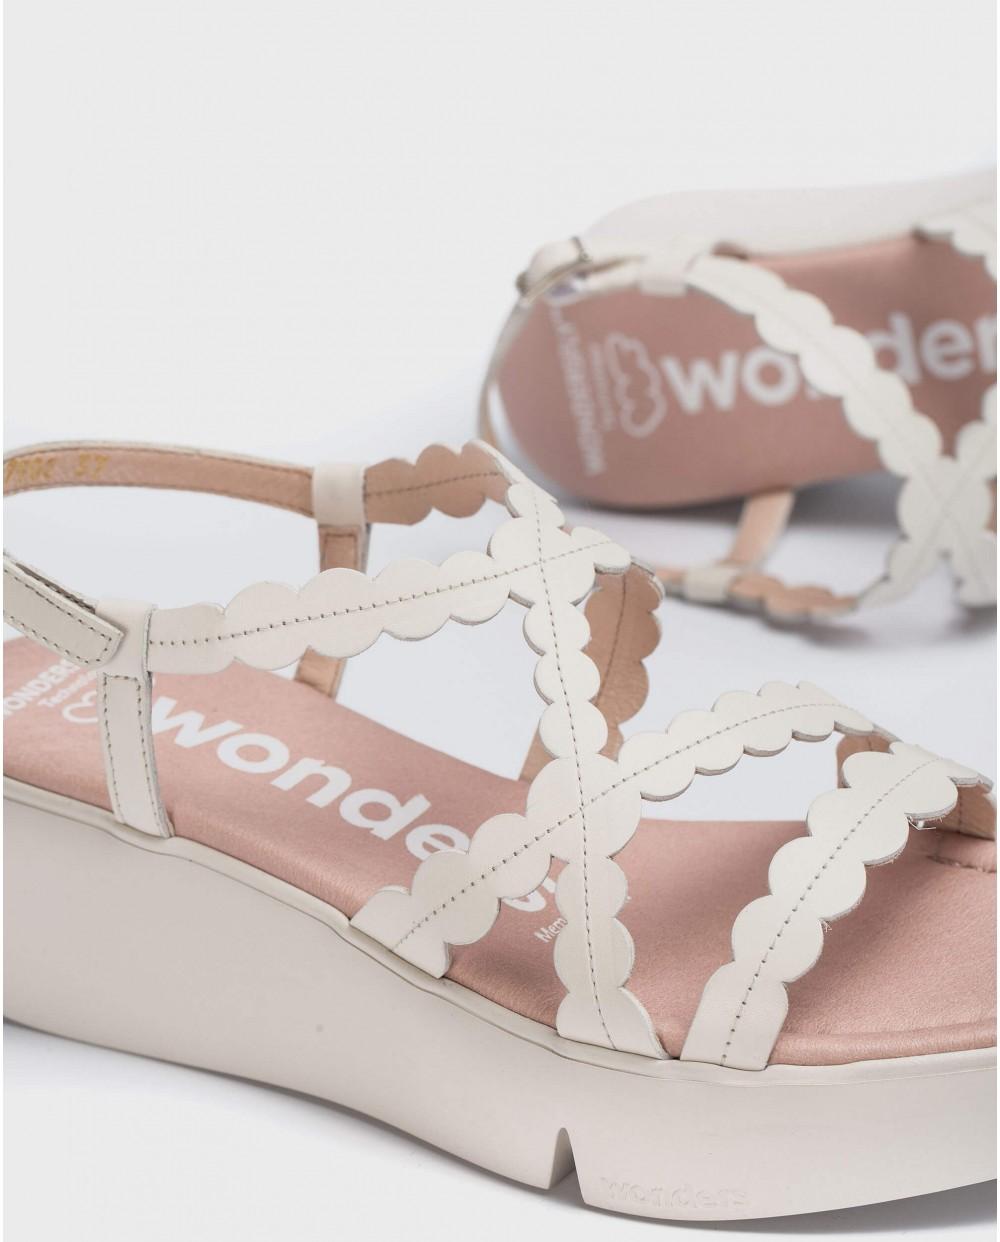 Wonders-Sandals-Wedge sandal with circles